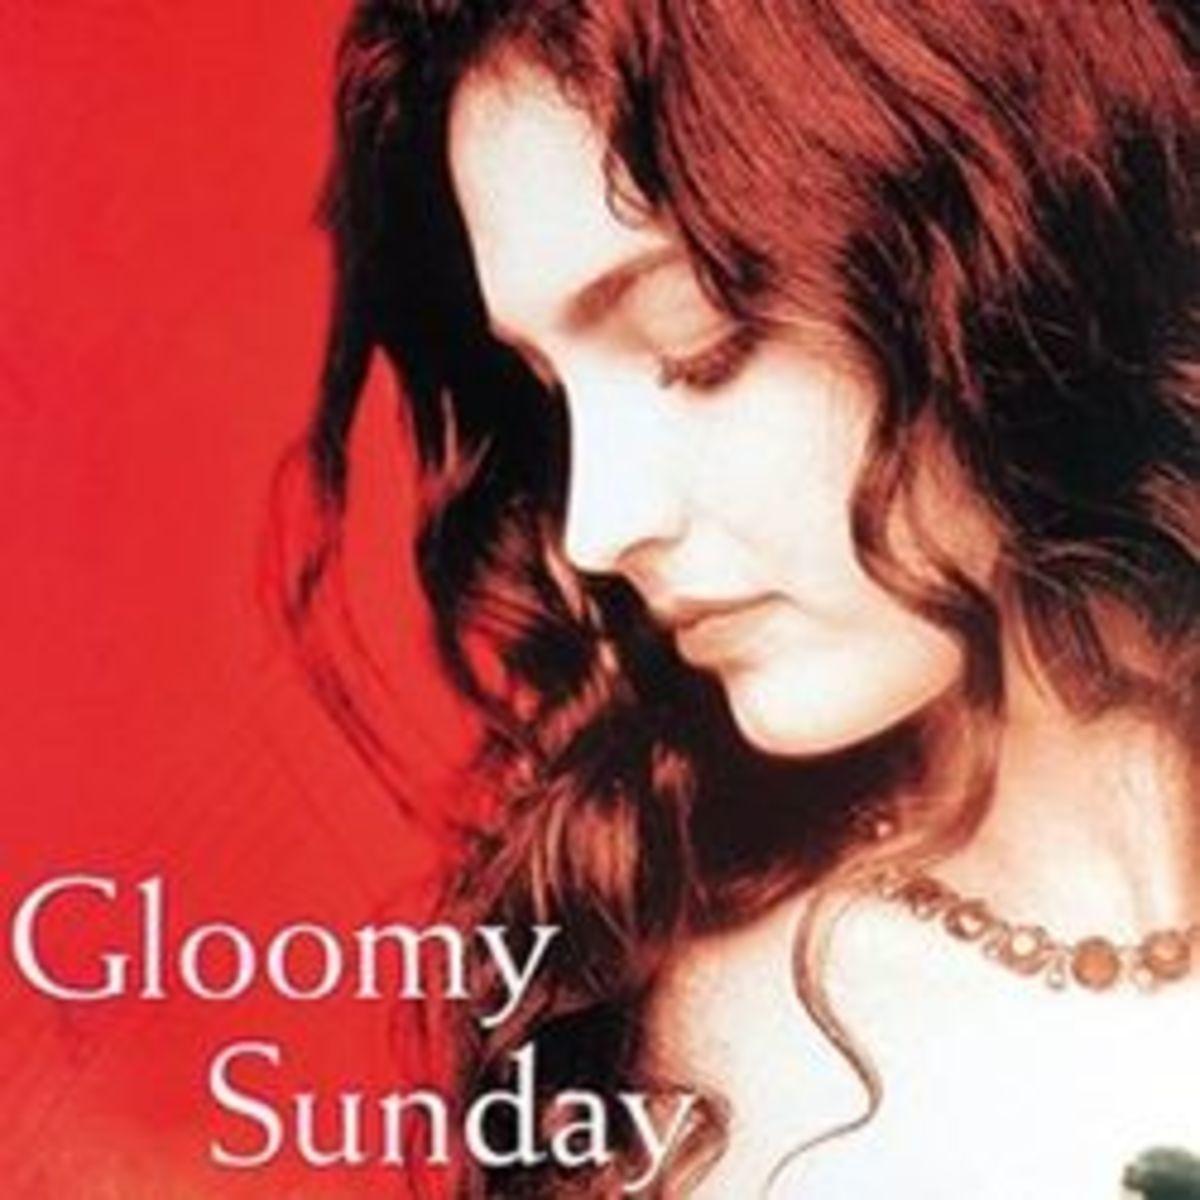 gloomy-sunday-2